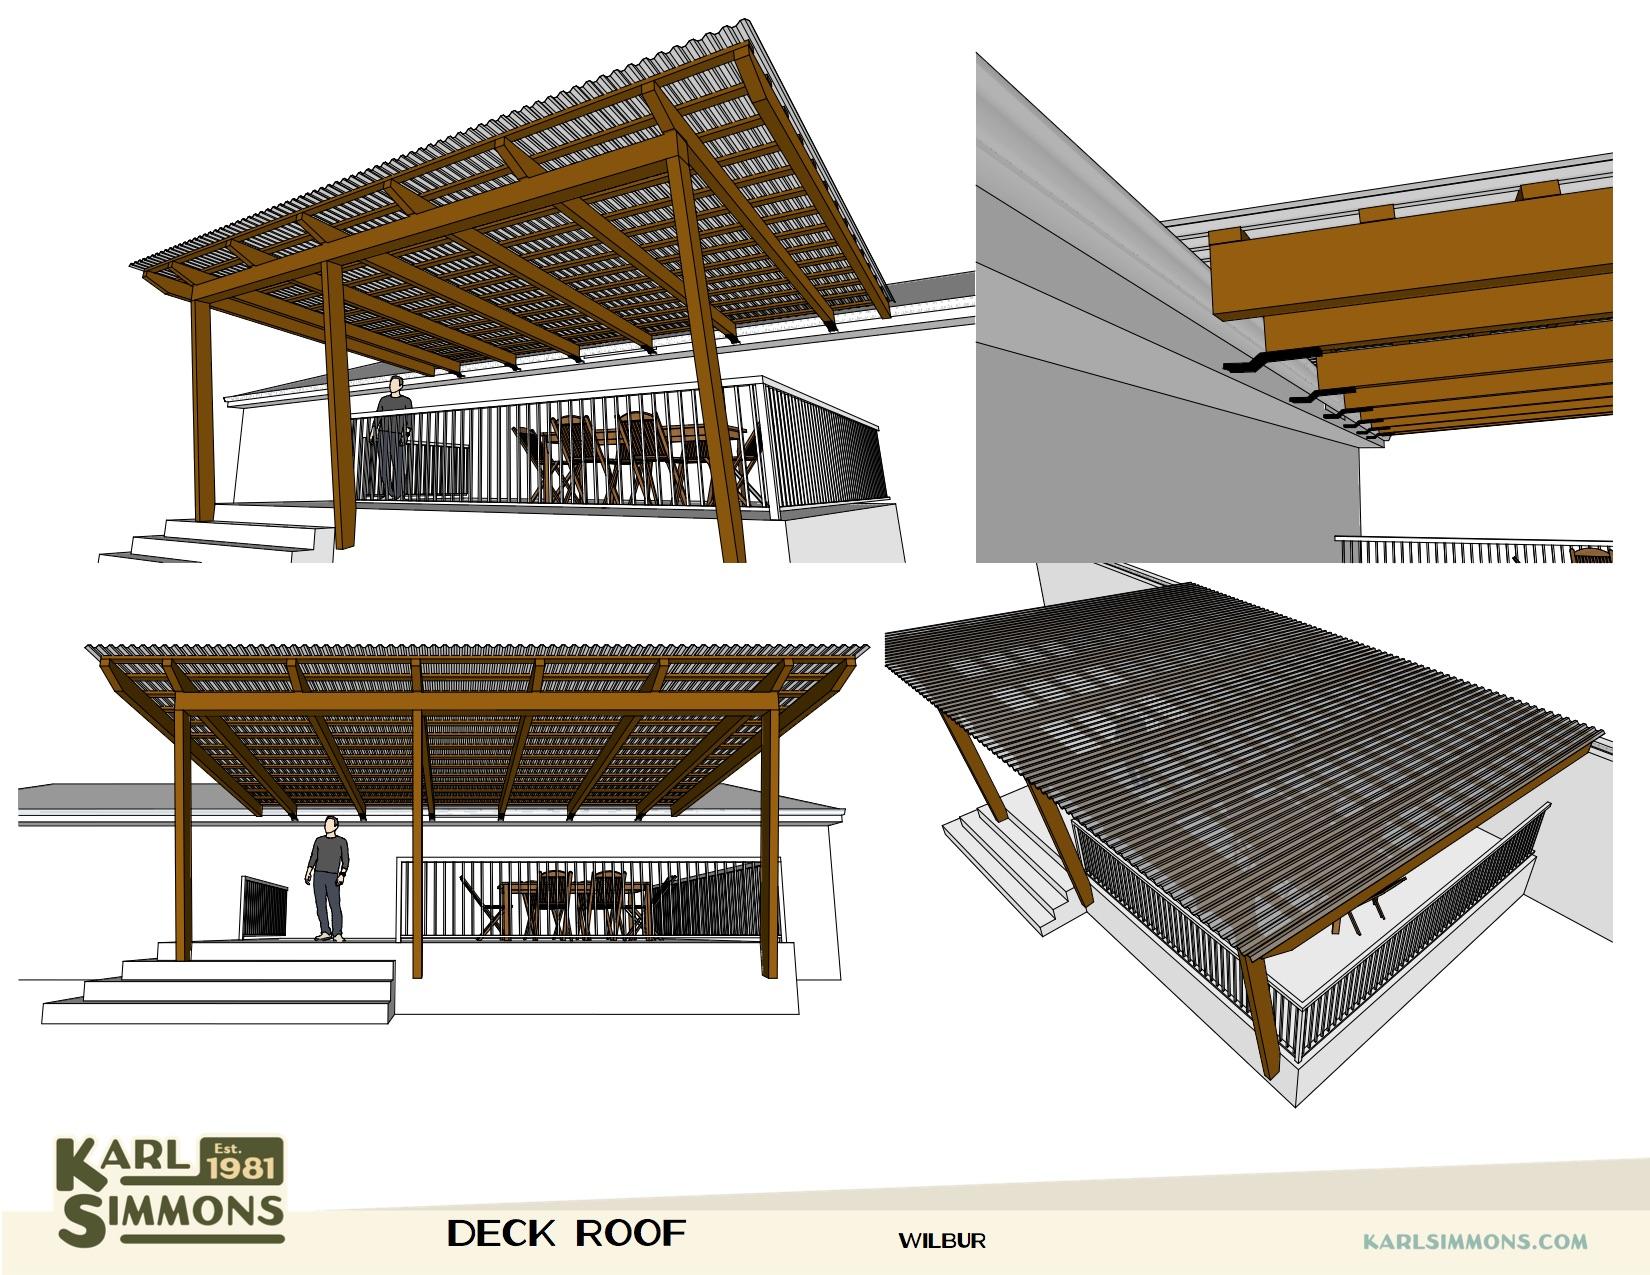 Craftsmen Contracting - Deck Roof Addition2.jpg